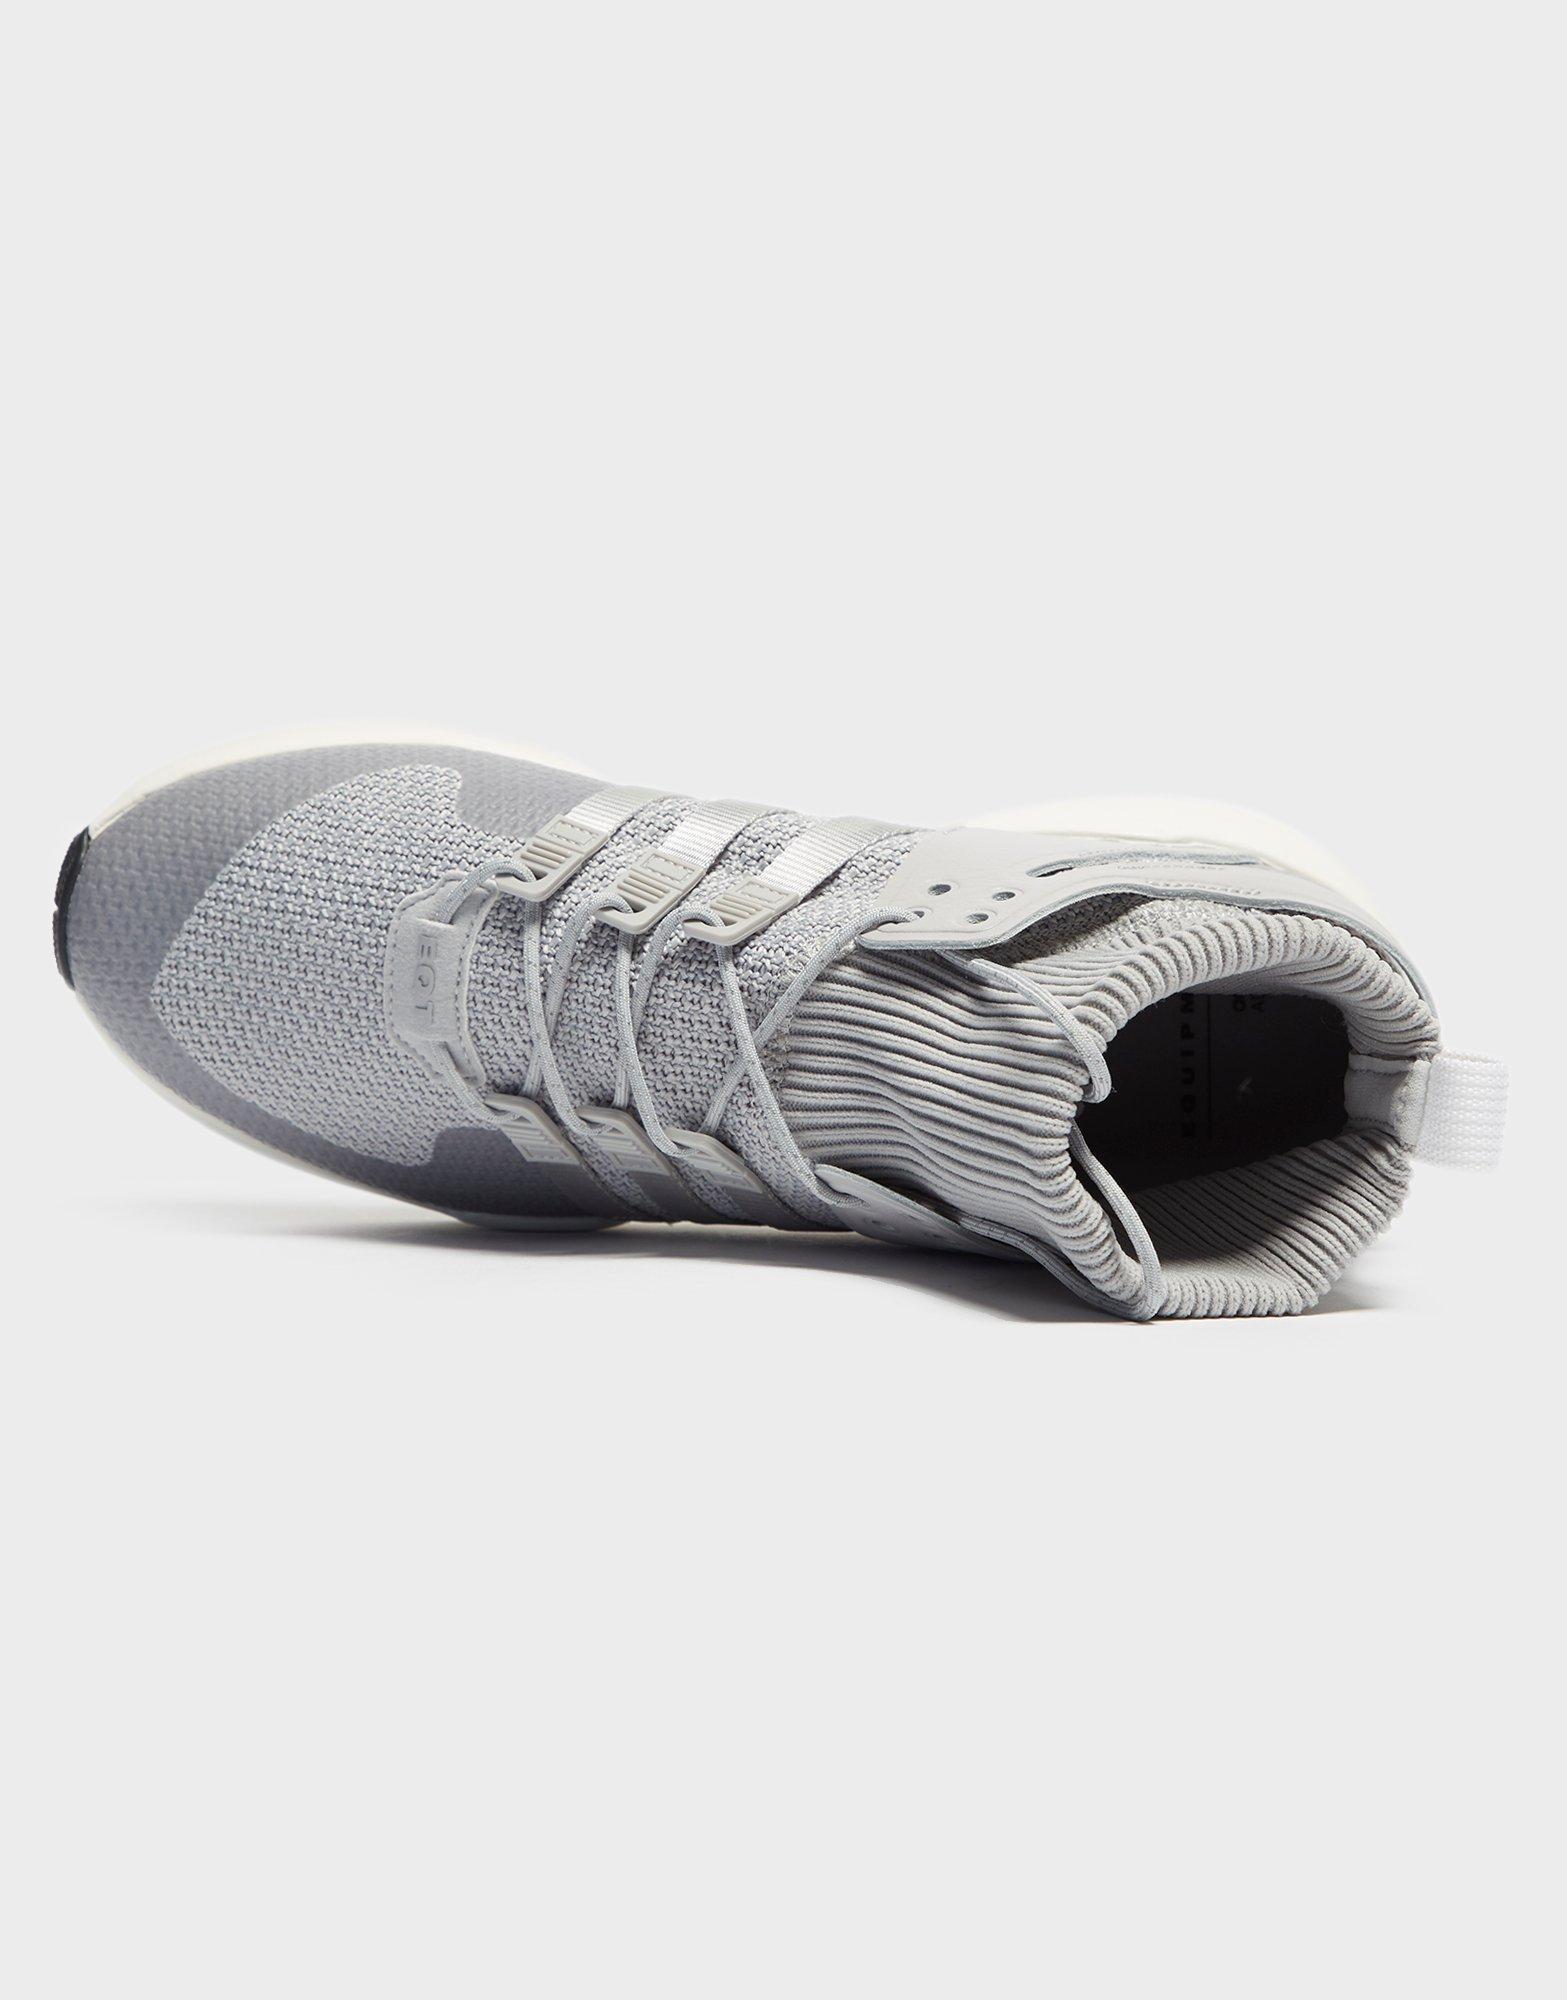 reputable site e1f69 5bef4 Adidas Originals - Multicolor Eqt Support Adv Winter for Men - Lyst. View  fullscreen